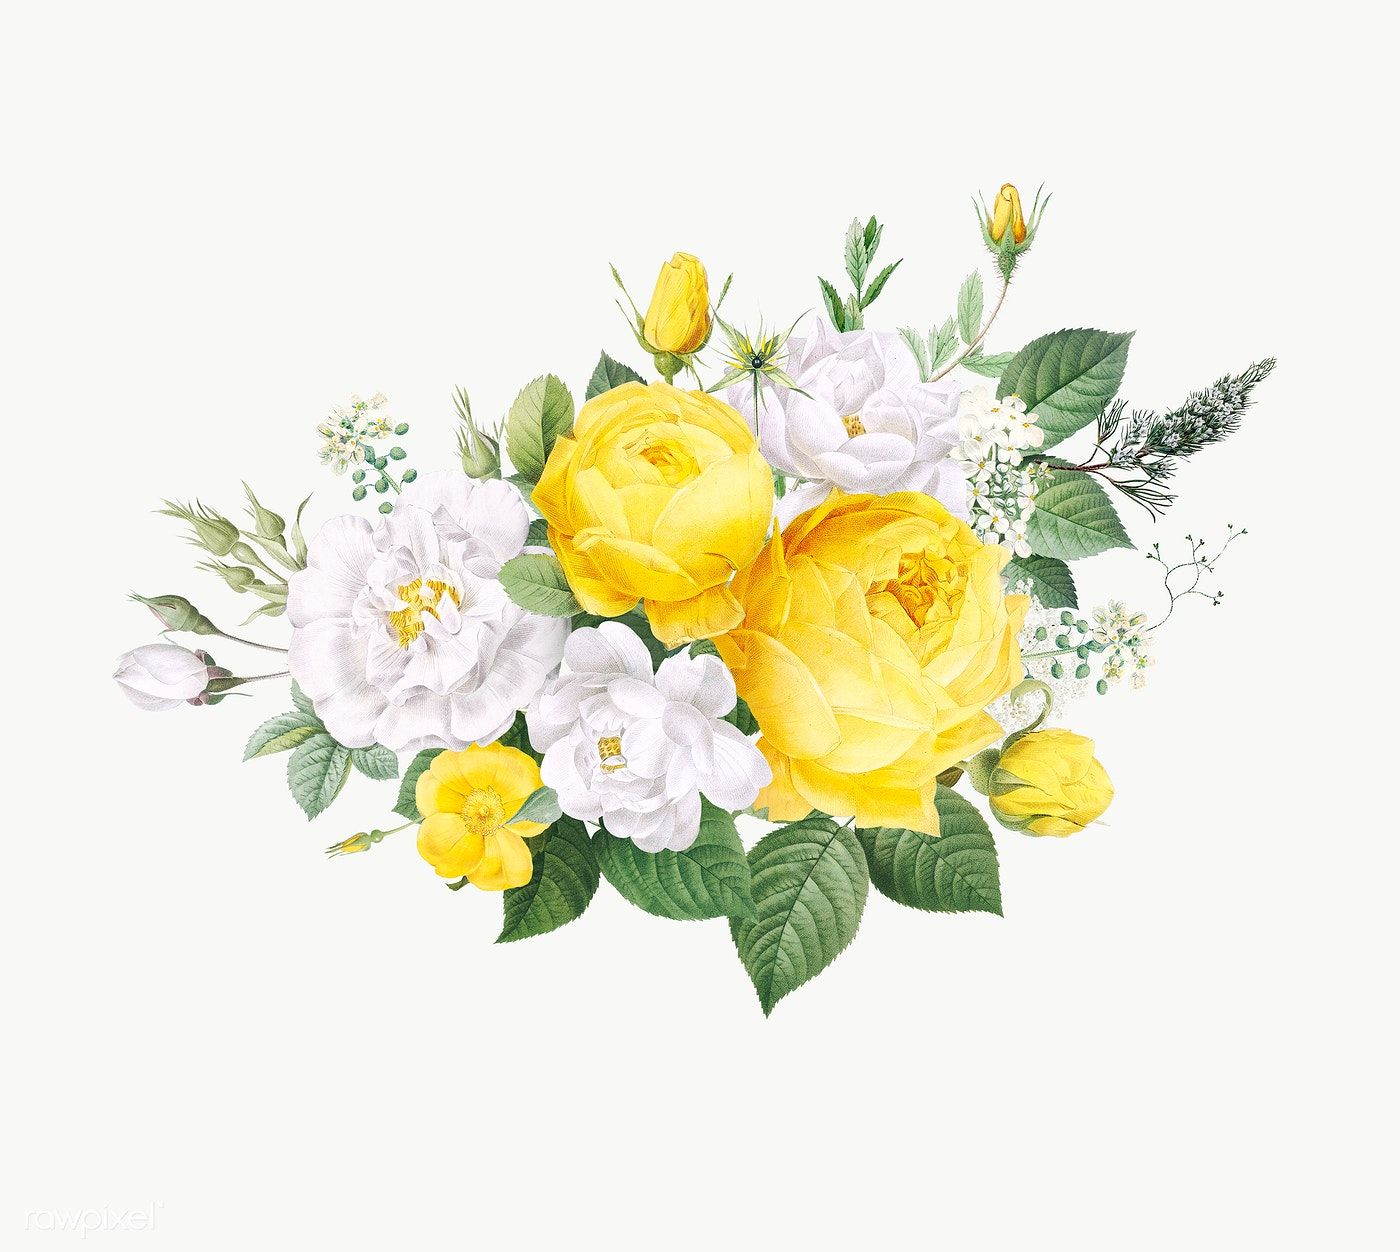 Download Premium Png Of Vintage Blooming Roses Design Transparent Png In 2020 Flower Illustration Flower Drawing Floral Watercolor